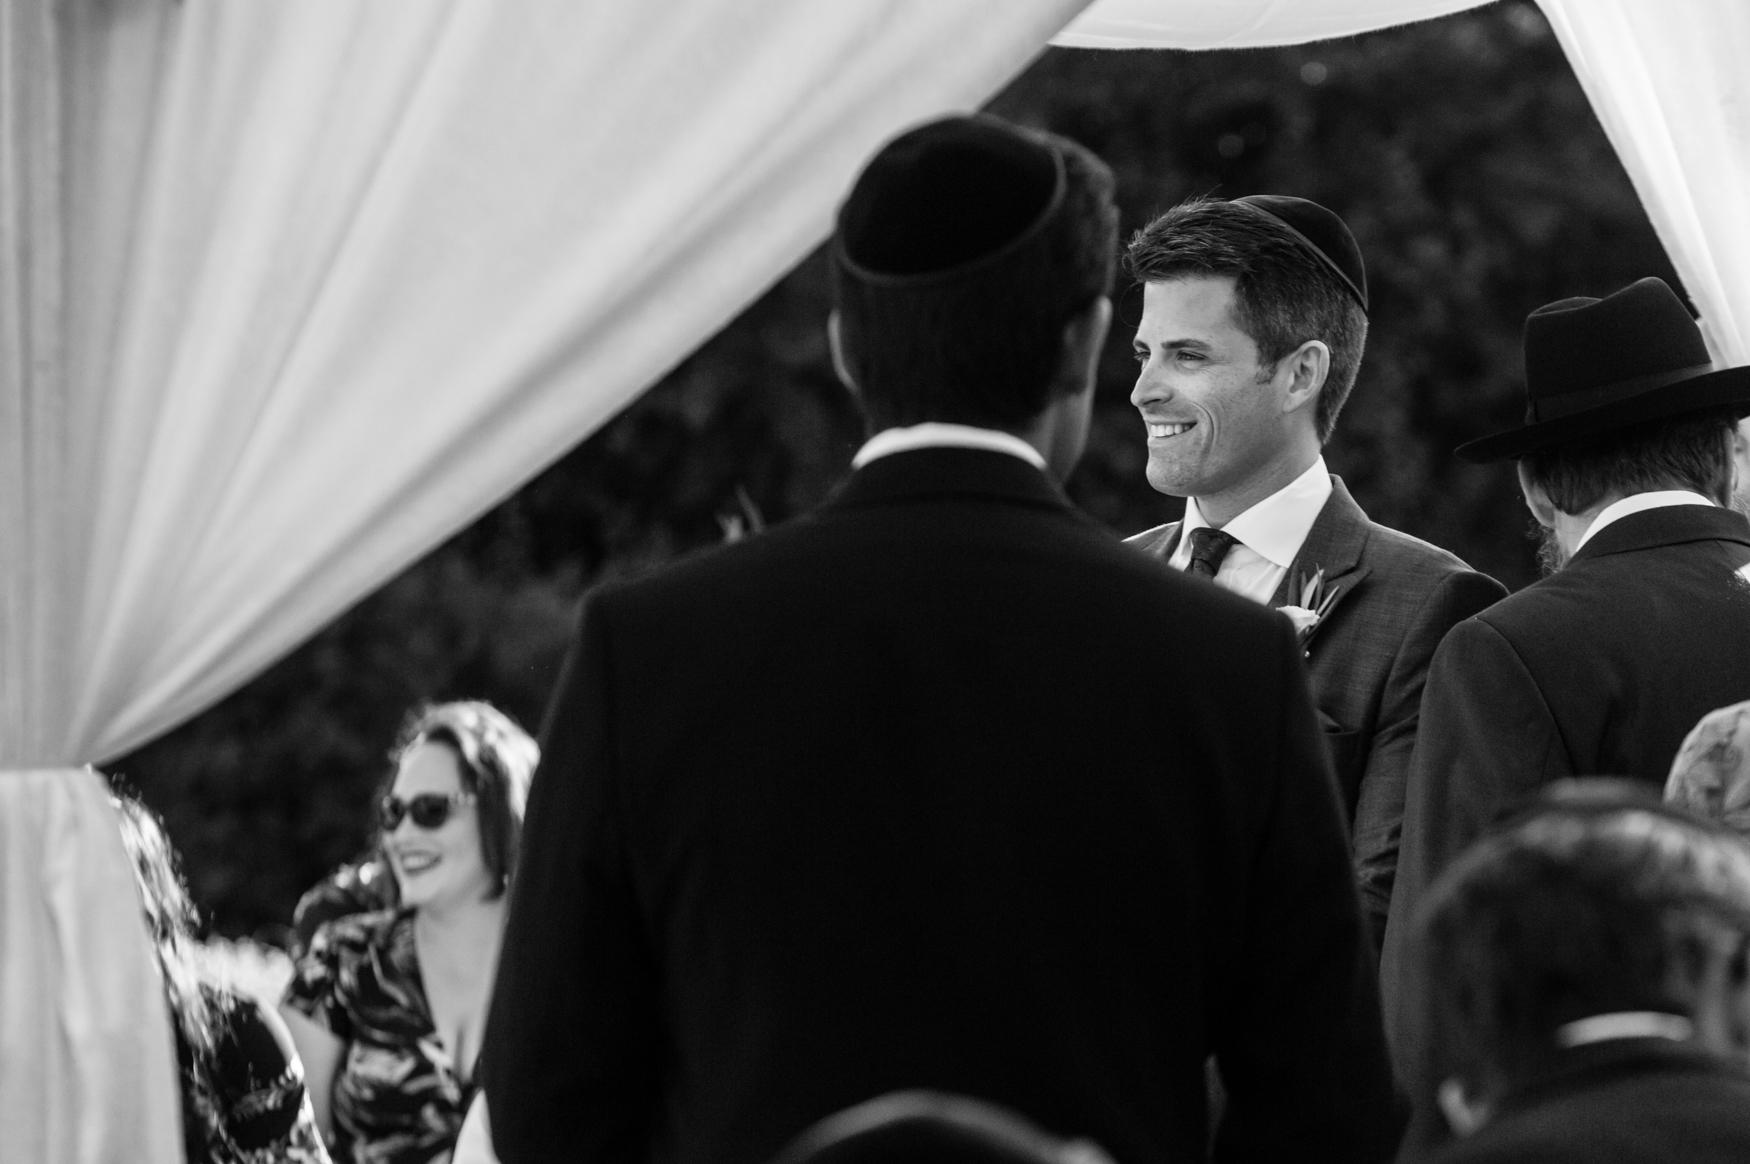 Leon_&_Martine's_Wedding_Photographs_17th_April_2019_@johnhenryweddingphoto_Low_Resolution_Web-219.JPG